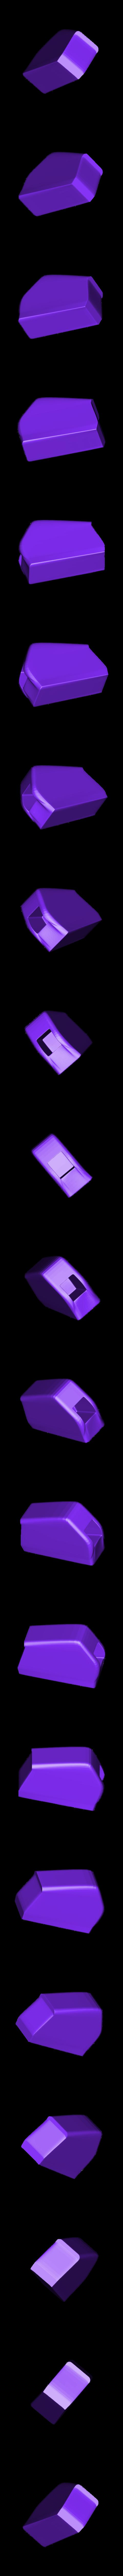 Lucio_slot_lft.stl Download free STL file Overwatch Lucio Blaster • 3D printer object, Adafruit